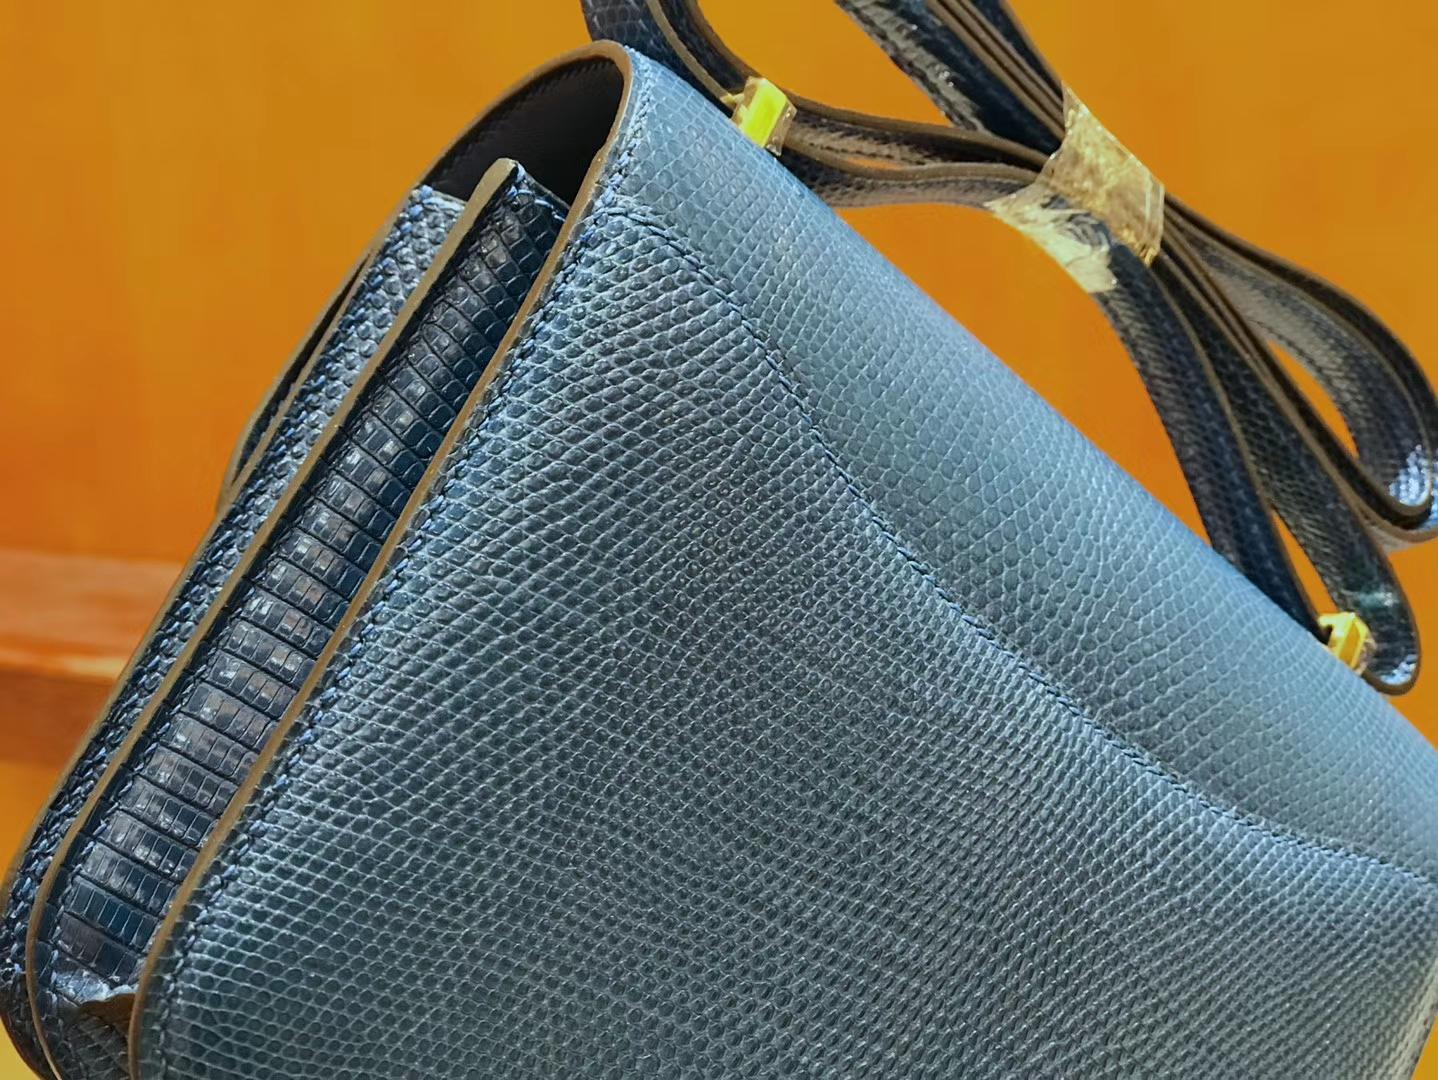 Hermès(爱马仕)Constance 18cm 海军蓝 南非蜥蜴皮 全手工缝制